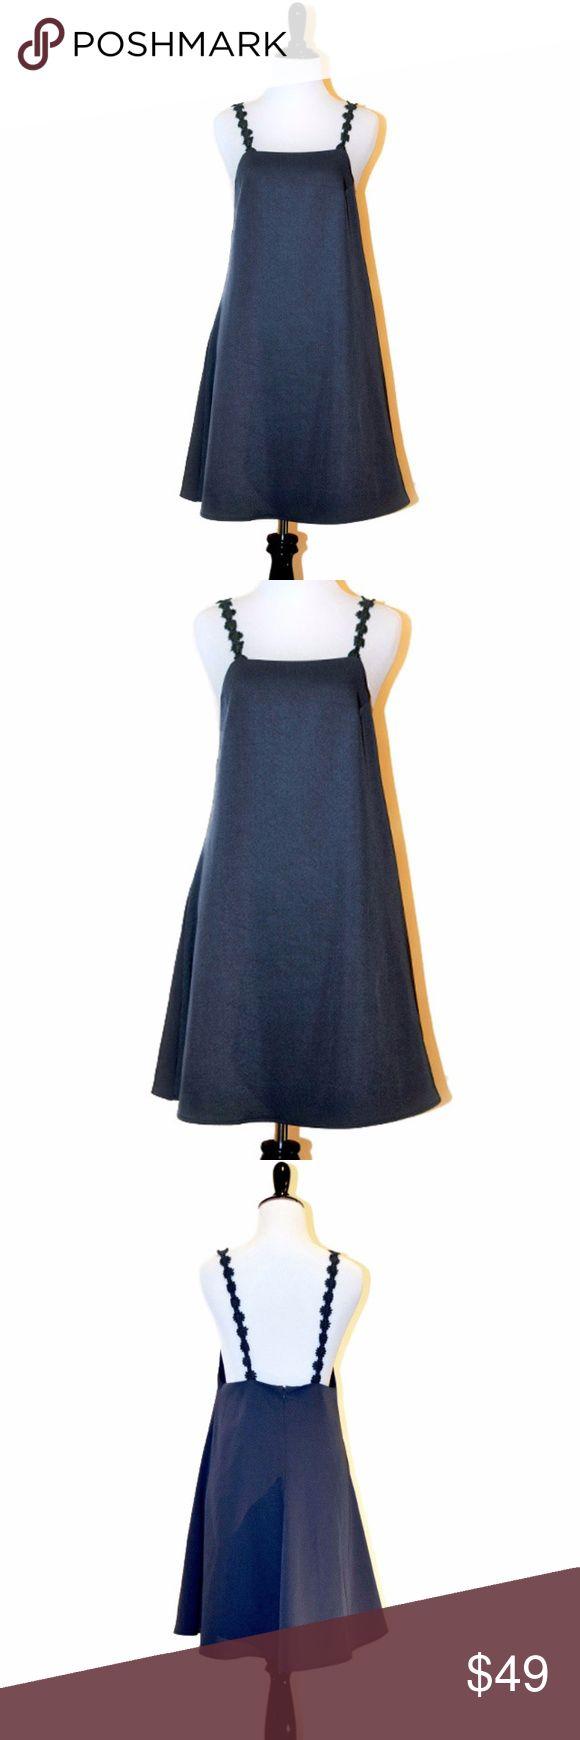 NWT Eric + lani Daisy Strap Grey Mini Dress Daisy Strap Mini Dress New With tag  Grey 100% Polyester Mini dress Hand wash cold, No care label Brand: Eric + lani Size Small Eric + lani Dresses Mini